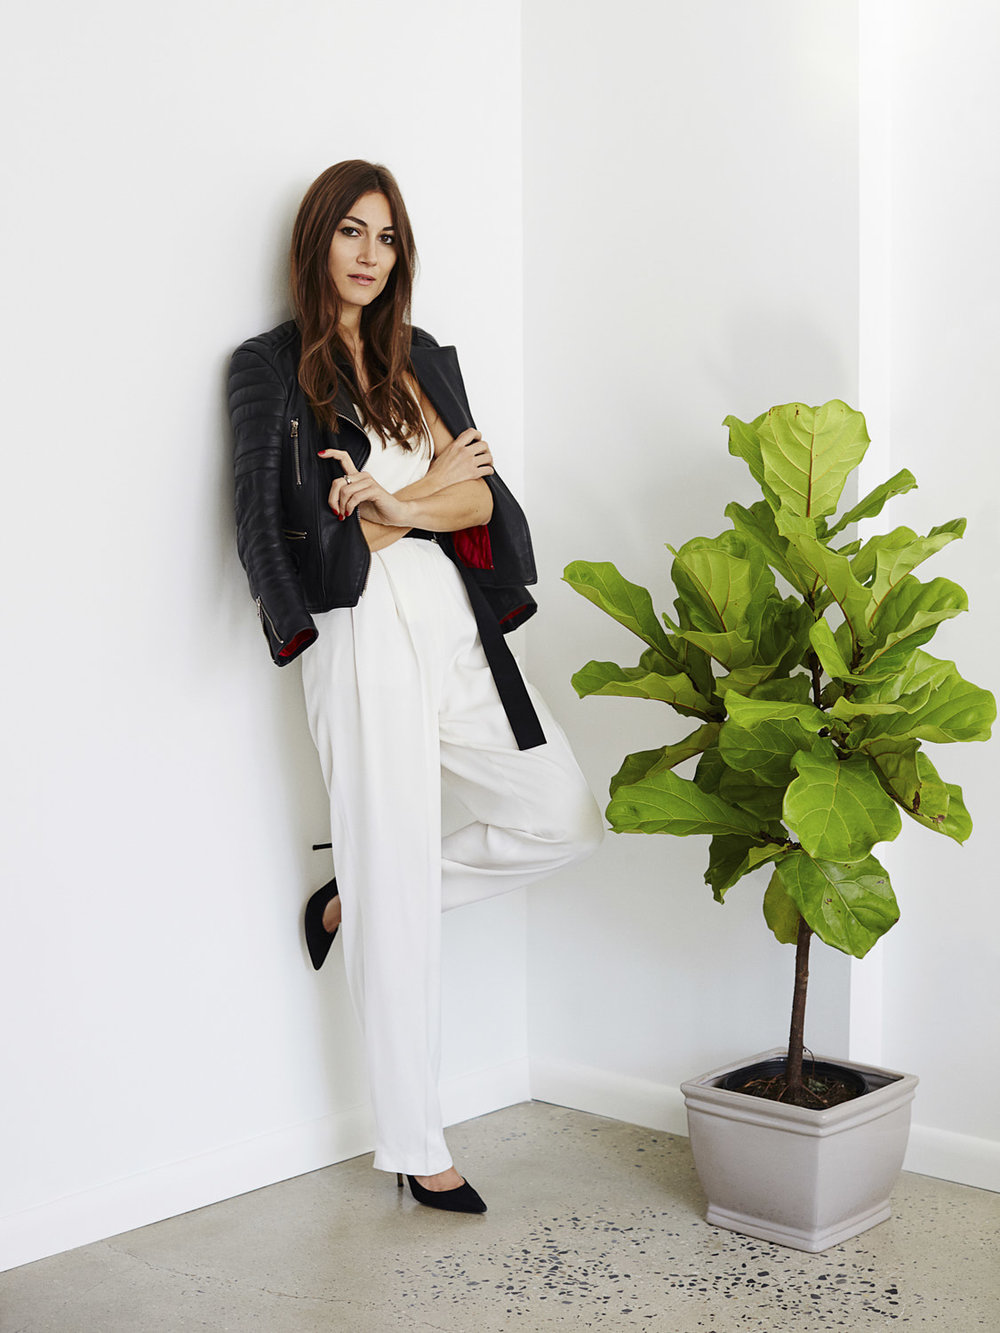 Giorgia Tordini/Harper's Bazaar Japan